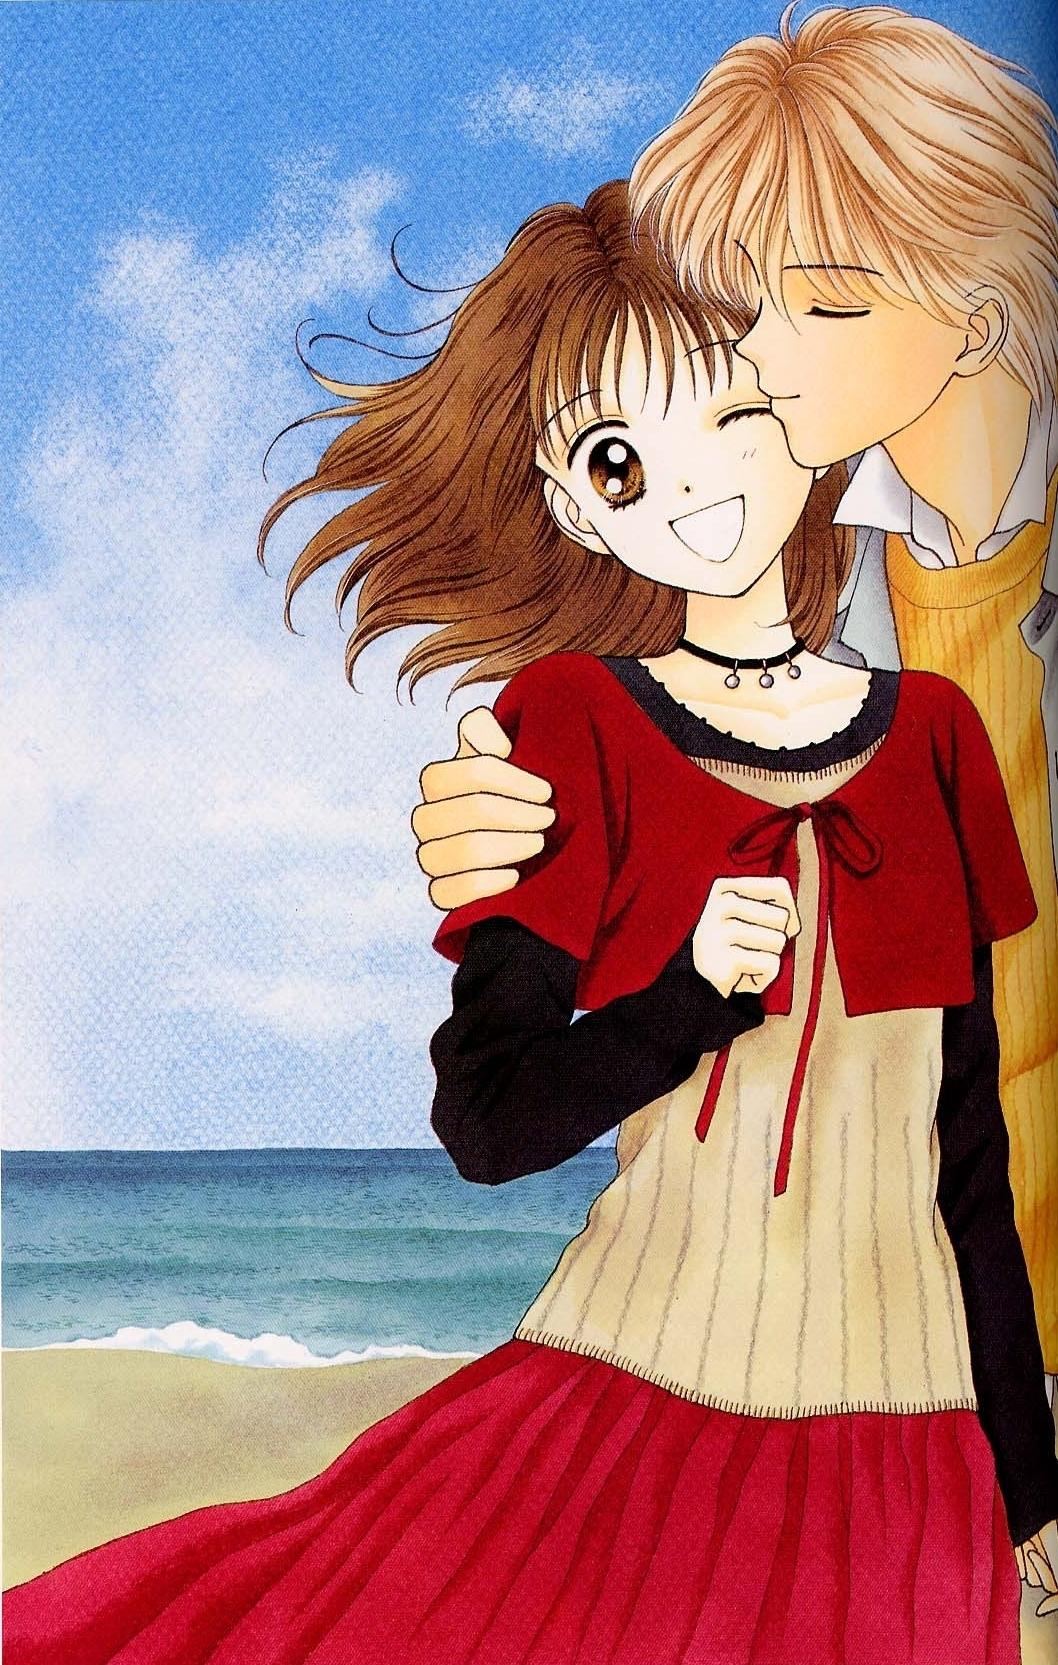 Pin by flora rose on marmalade boy anime/manga Anime